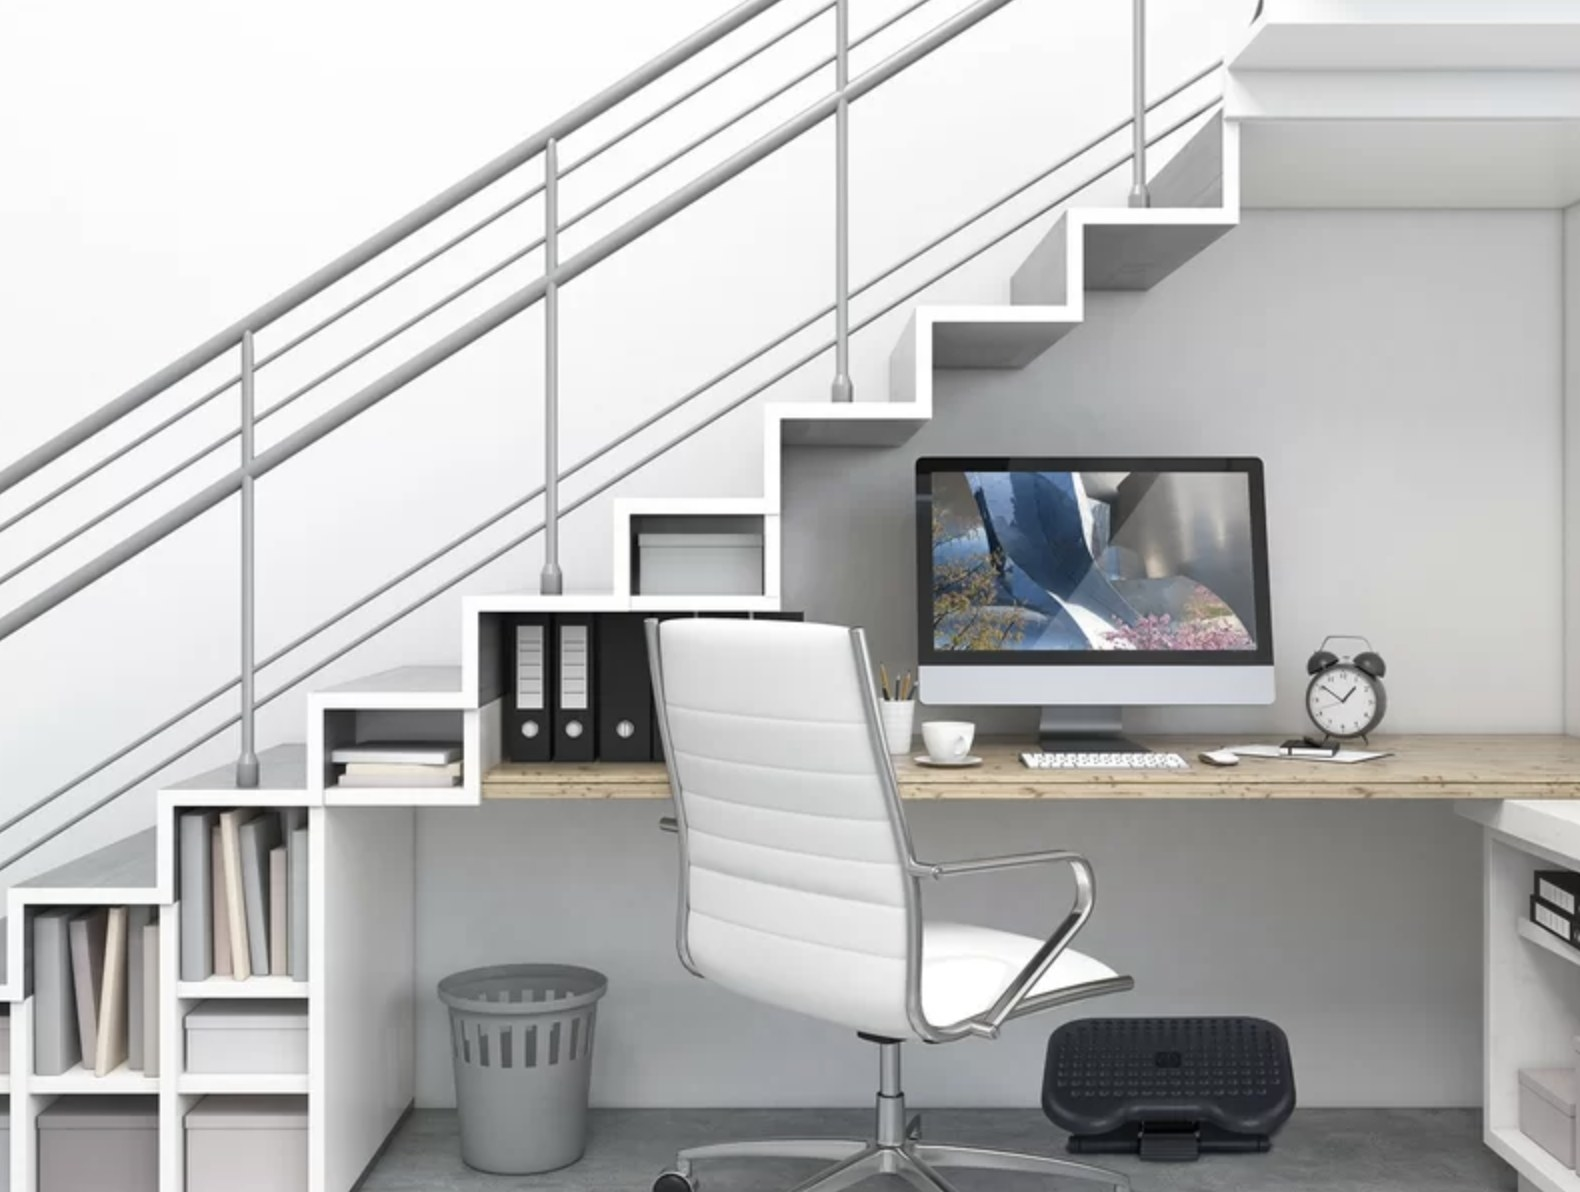 A footrest under a desk